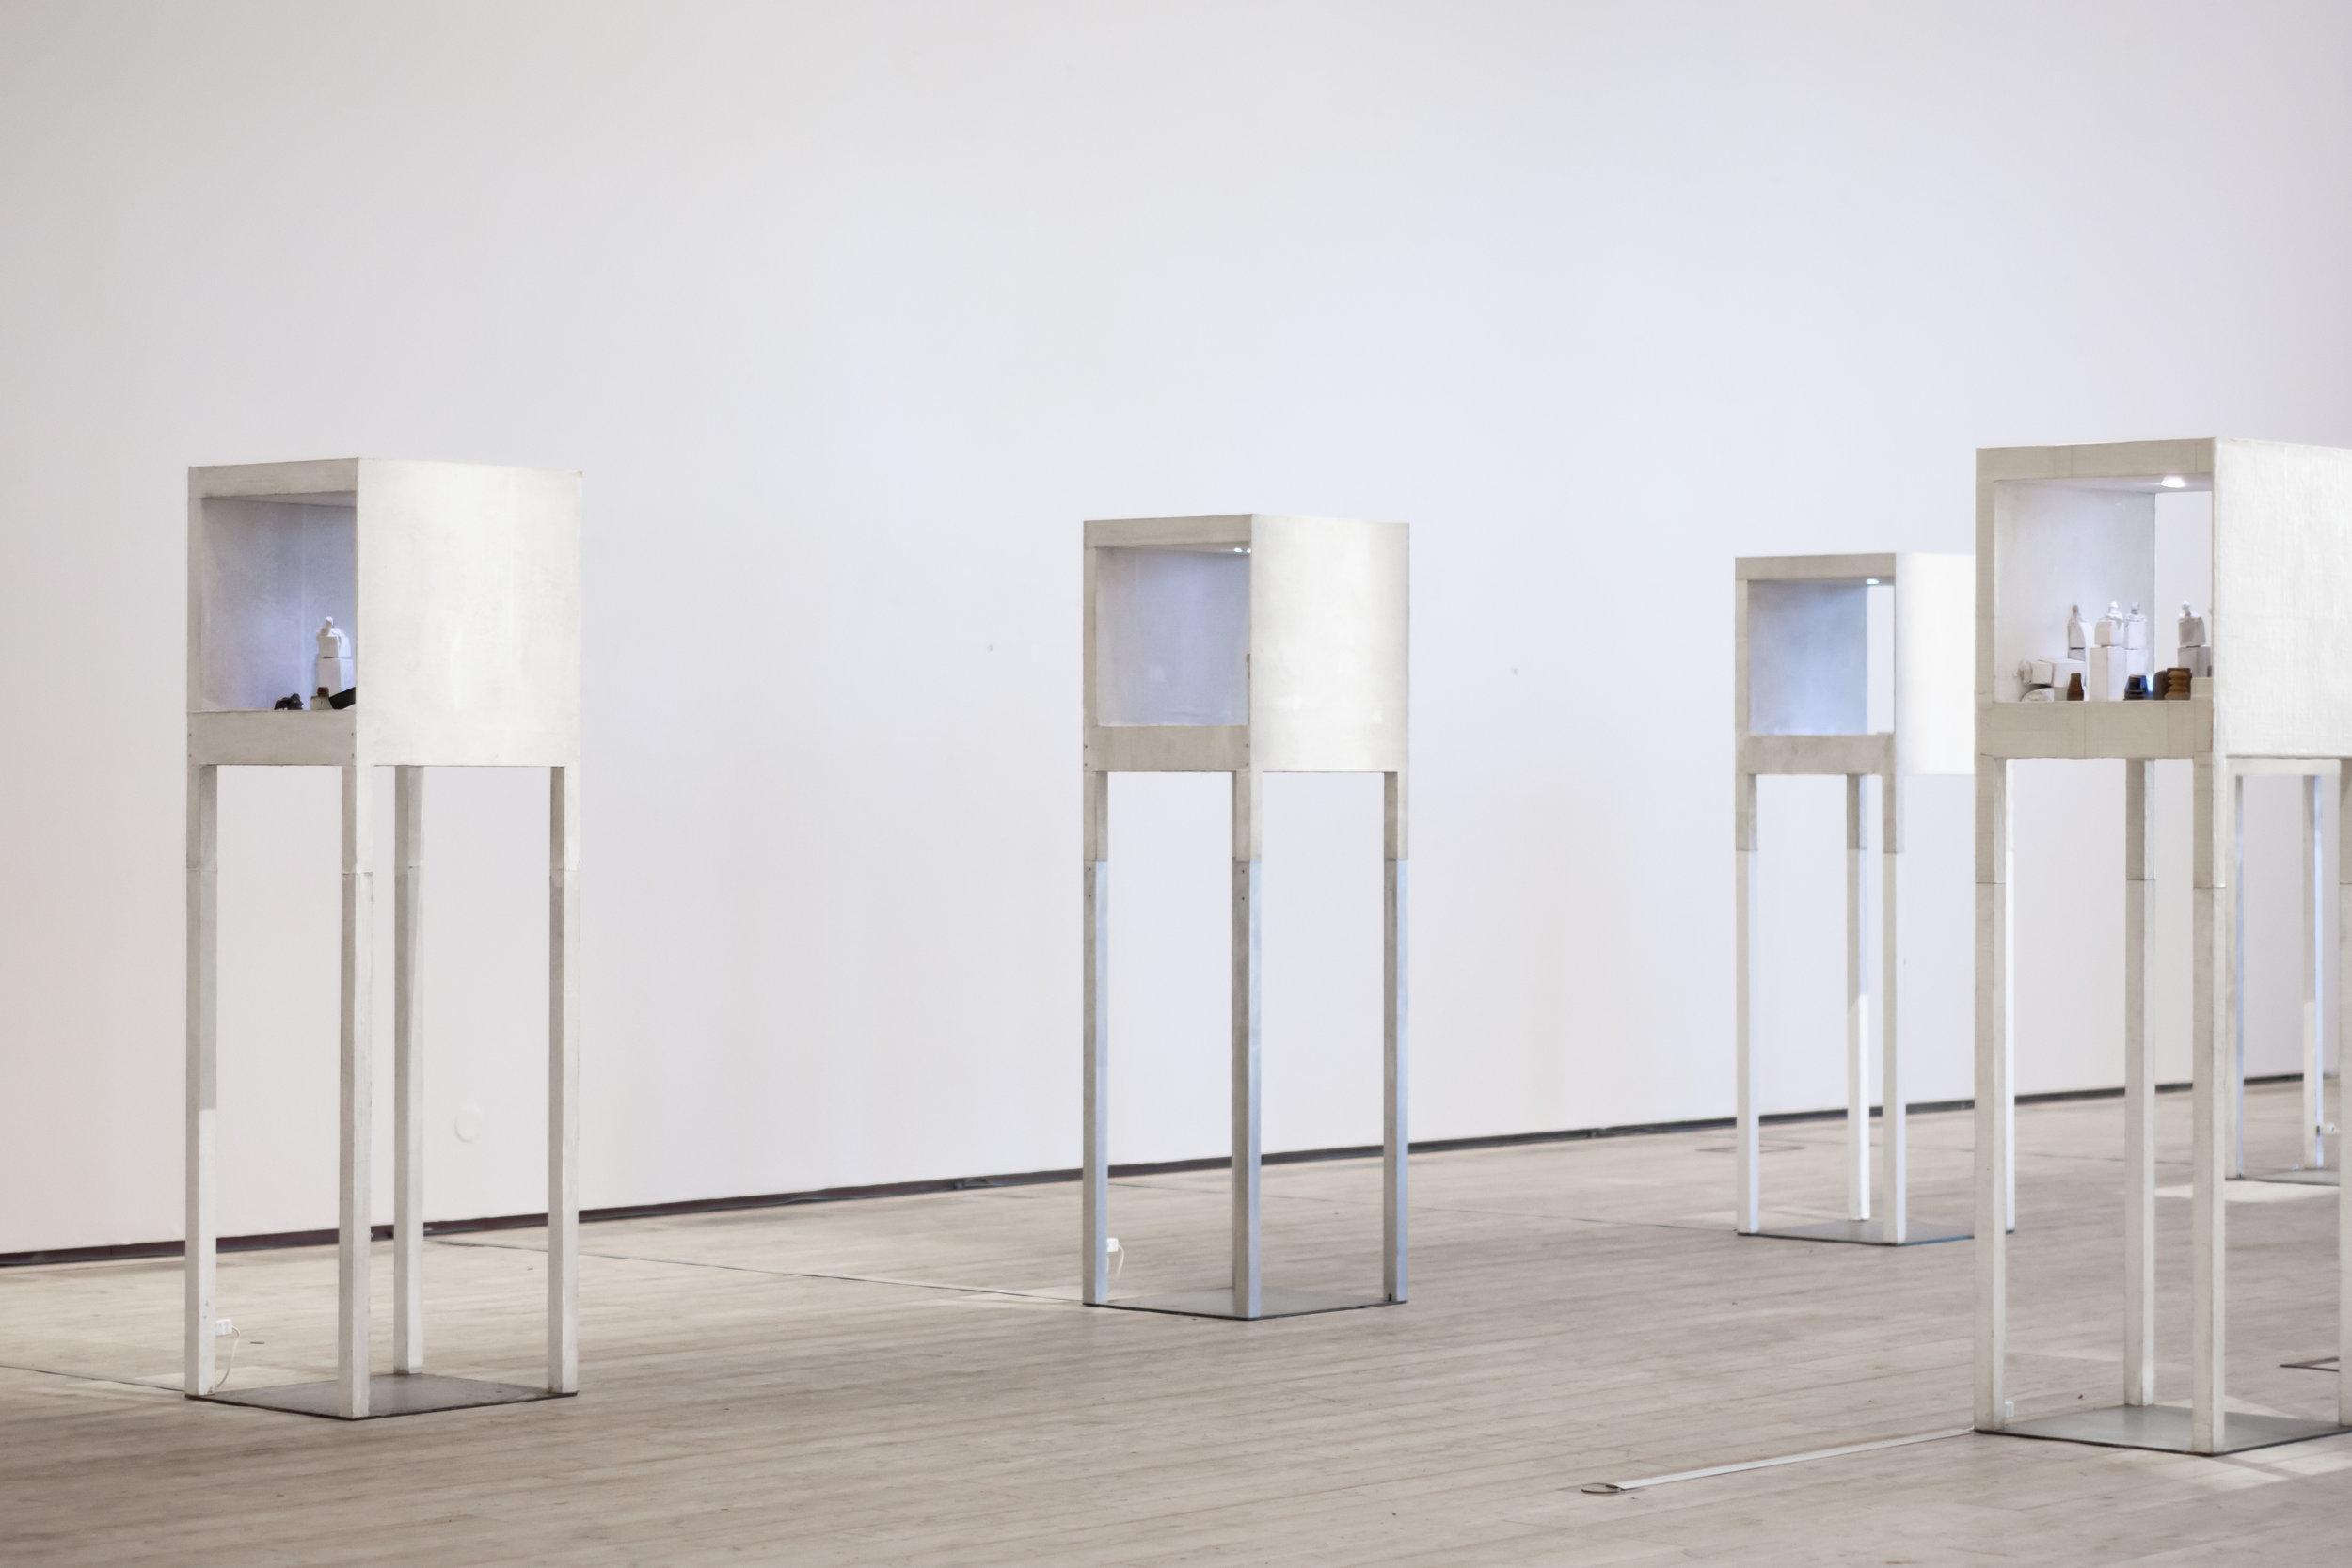 Scenes 1-10 installation view, Kristinehamns Art Museum winter 2018-19, foto Nina Simonen